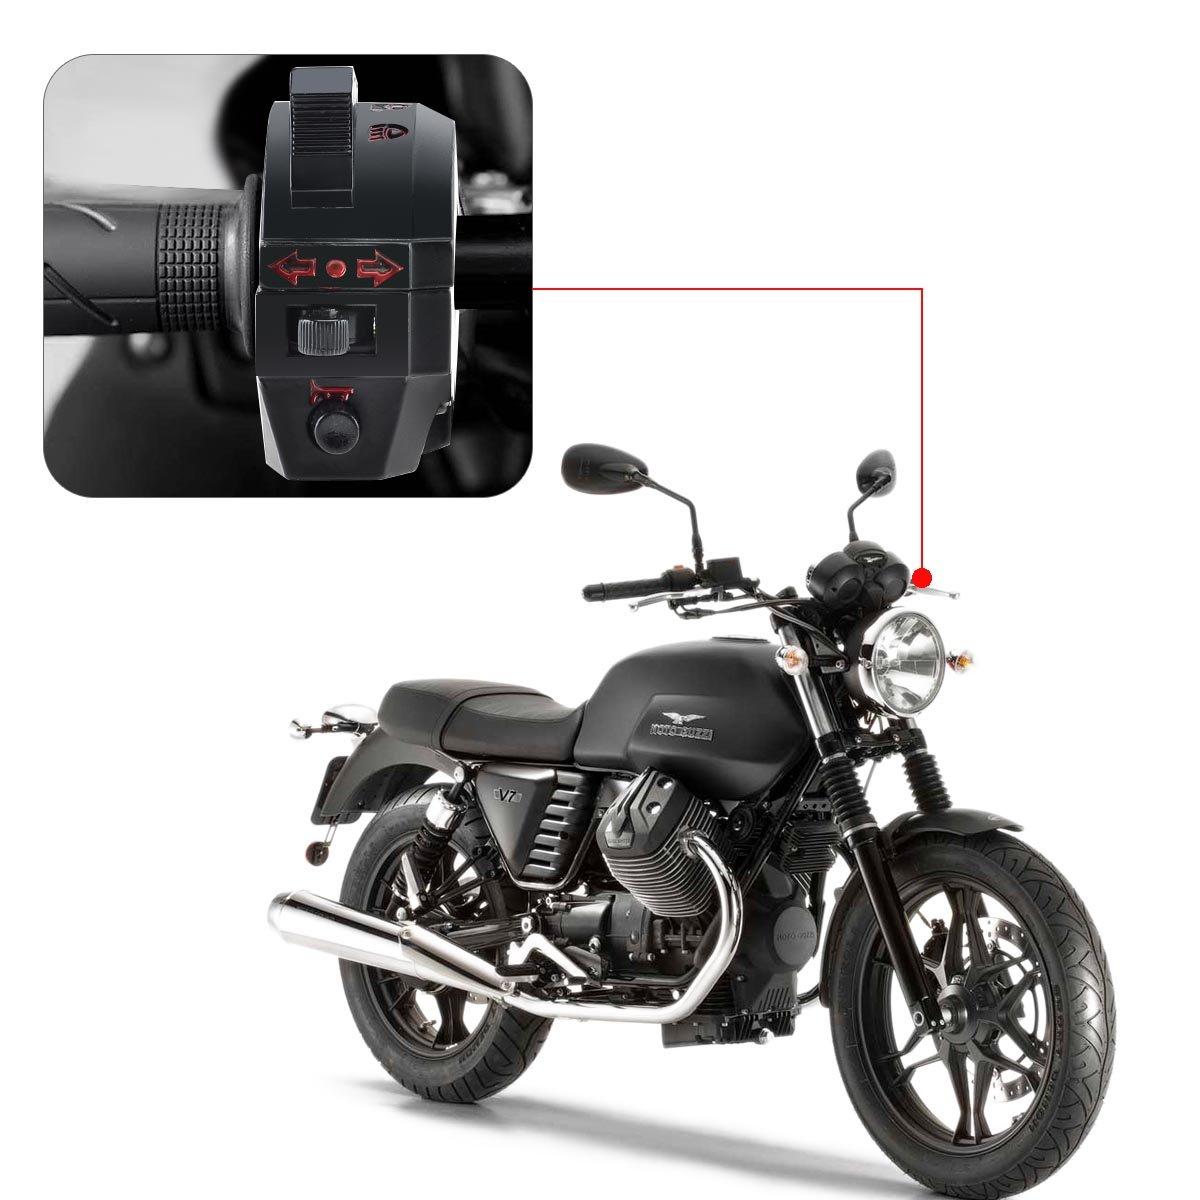 Kawell Switch Light Turn Signal Dirt Bike Honda Ktm Dual Sport Wiring Diagram Suzuki Kawasaki Yamaha Motorcycle Universal 520 450 530 500 250 Wr Wrf Xr 600